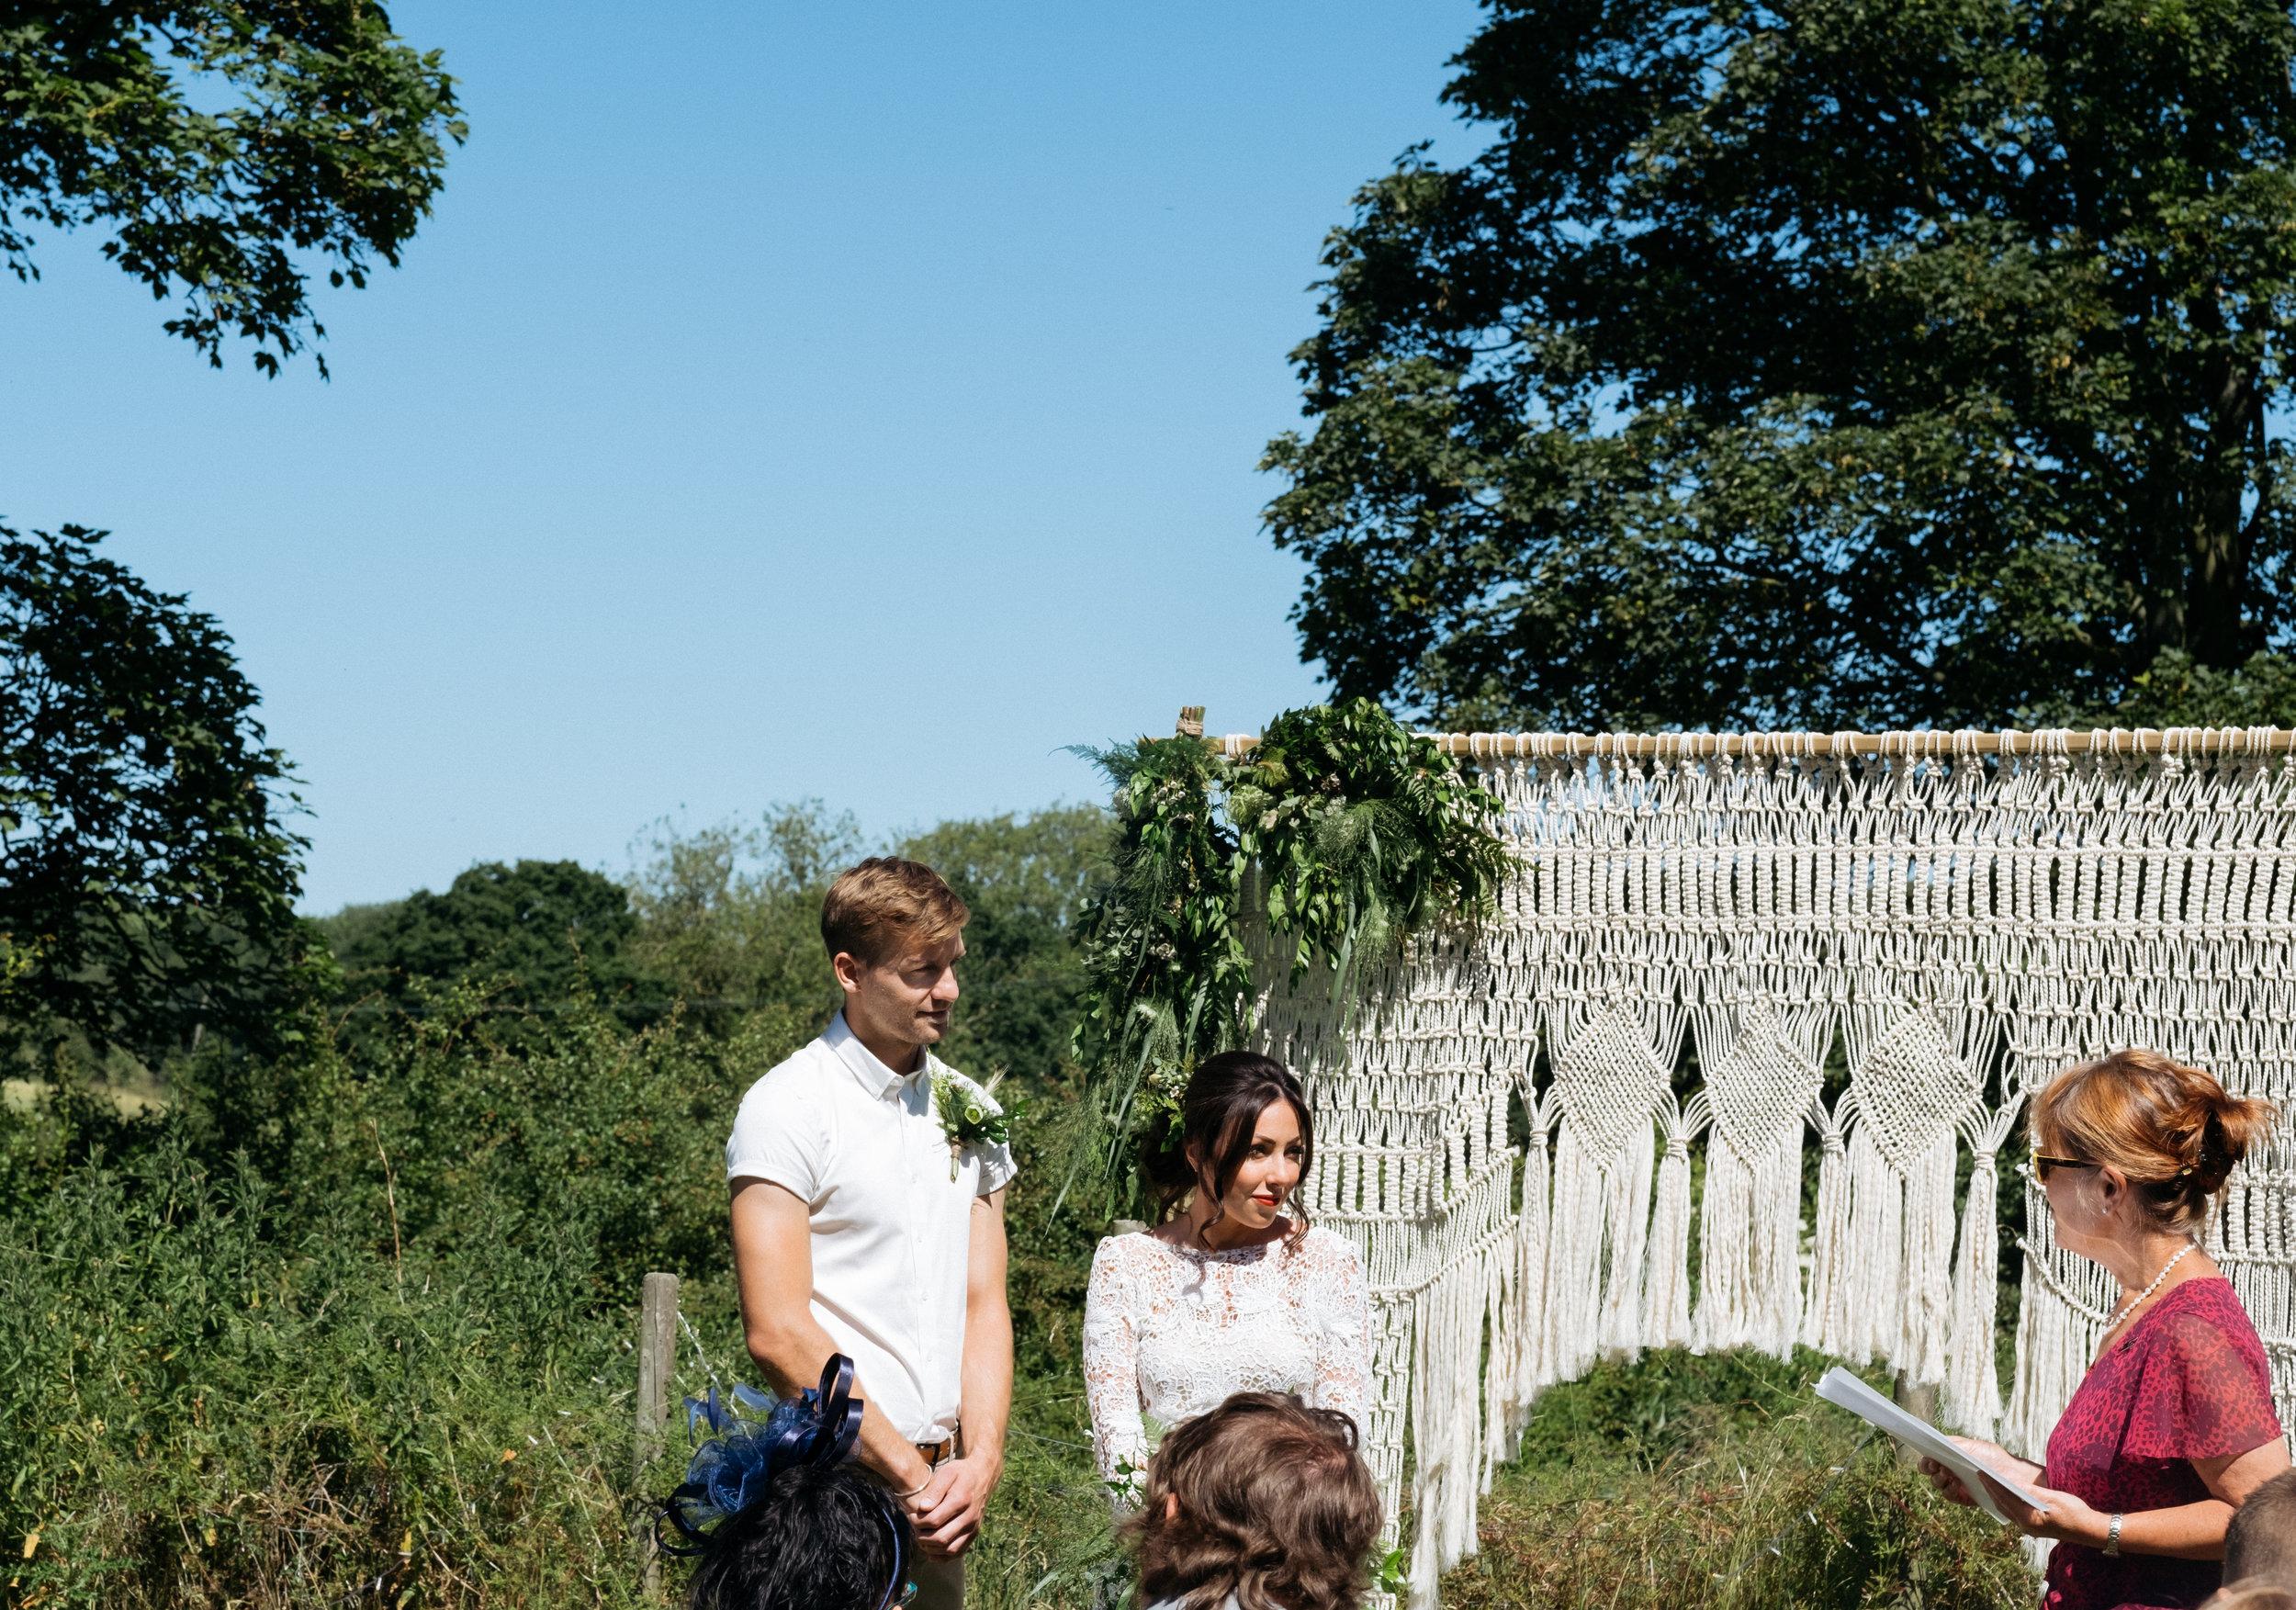 Outdoor wedding ceremony with macrame wedding arch